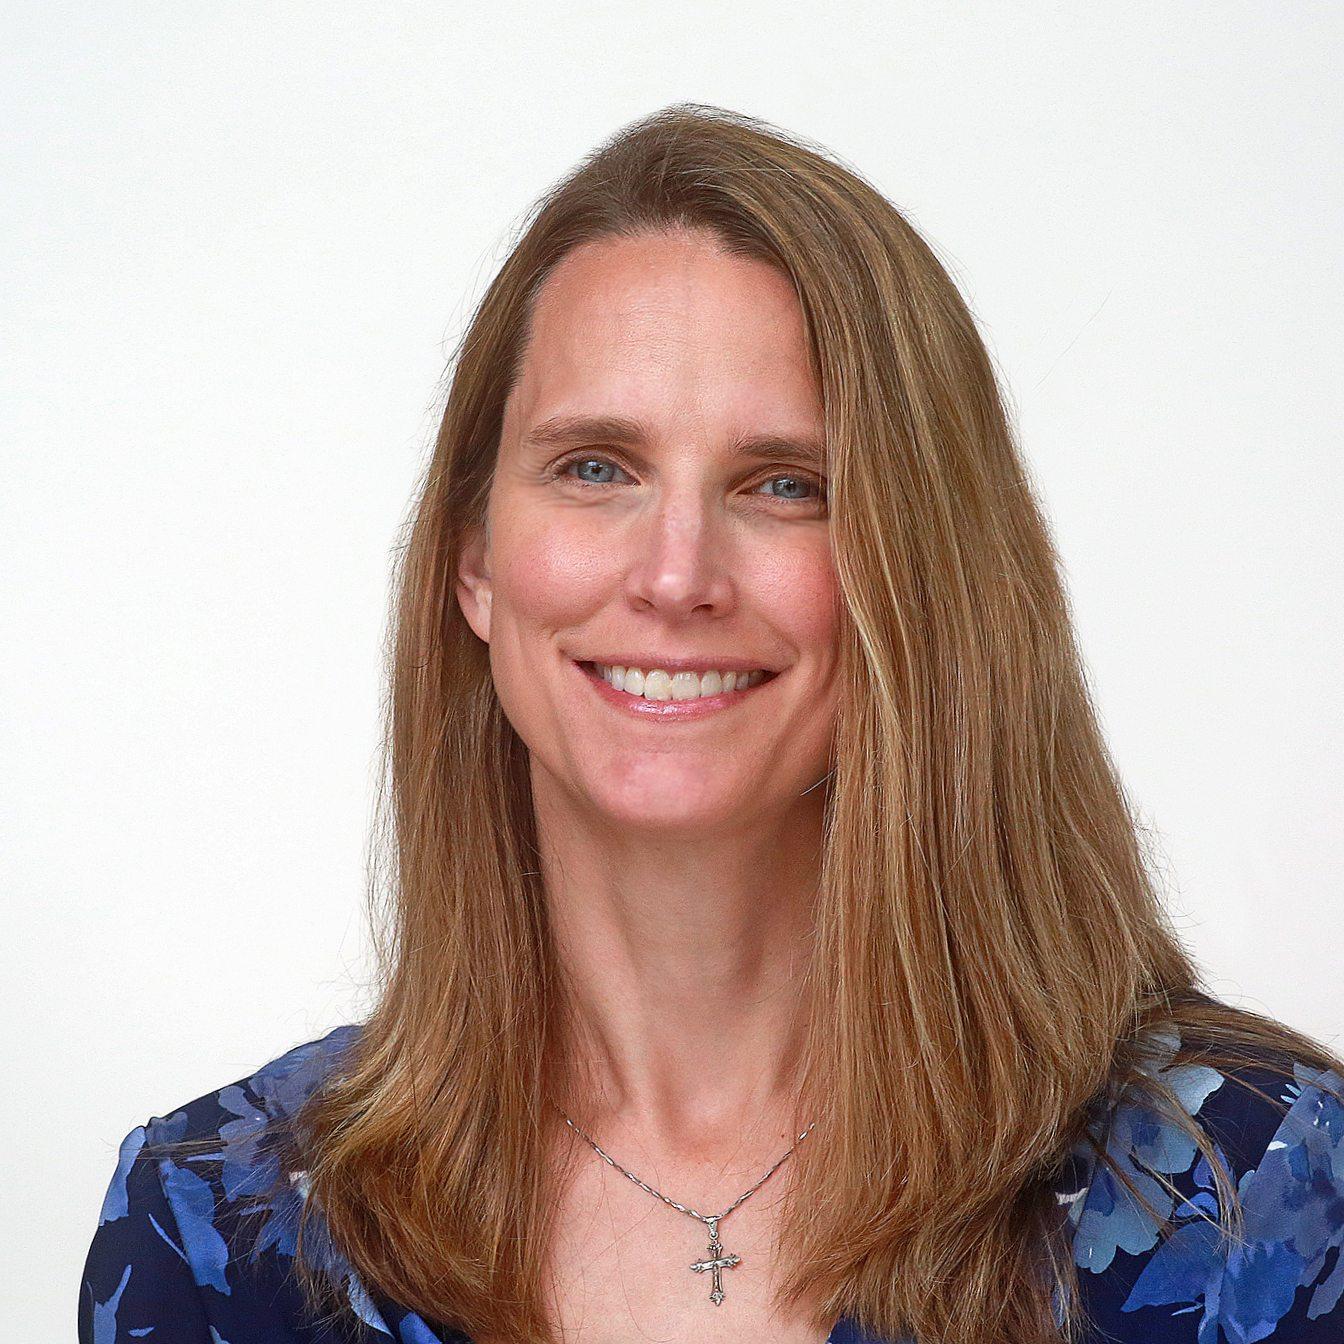 Kathy Judkins